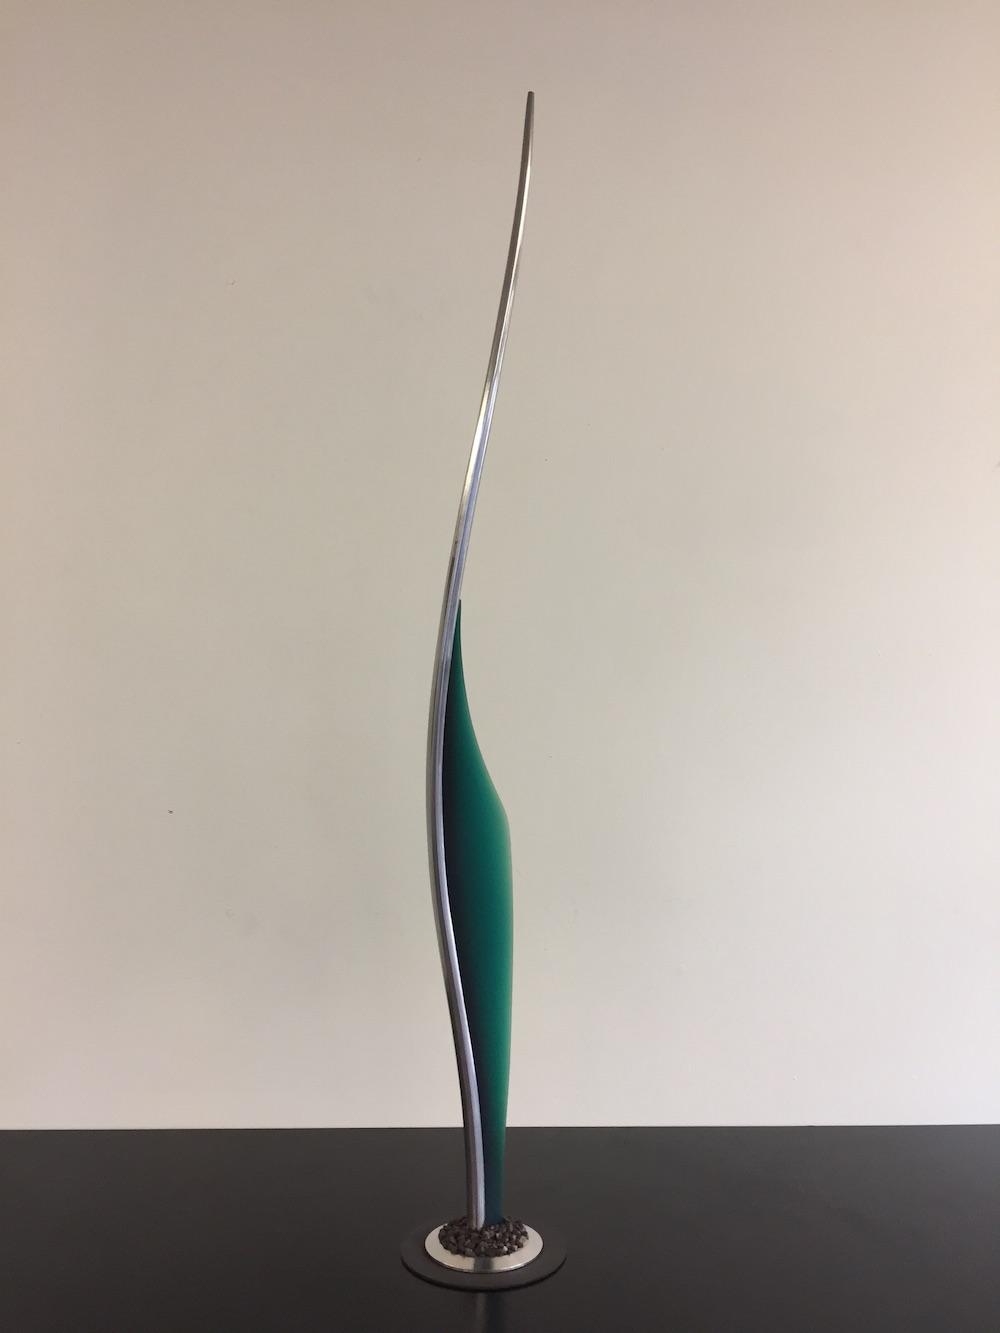 Joe Neeson, Folium 2 (maquette for public sculpture), stainless steel & polyurethane resin, 120 x 15cm